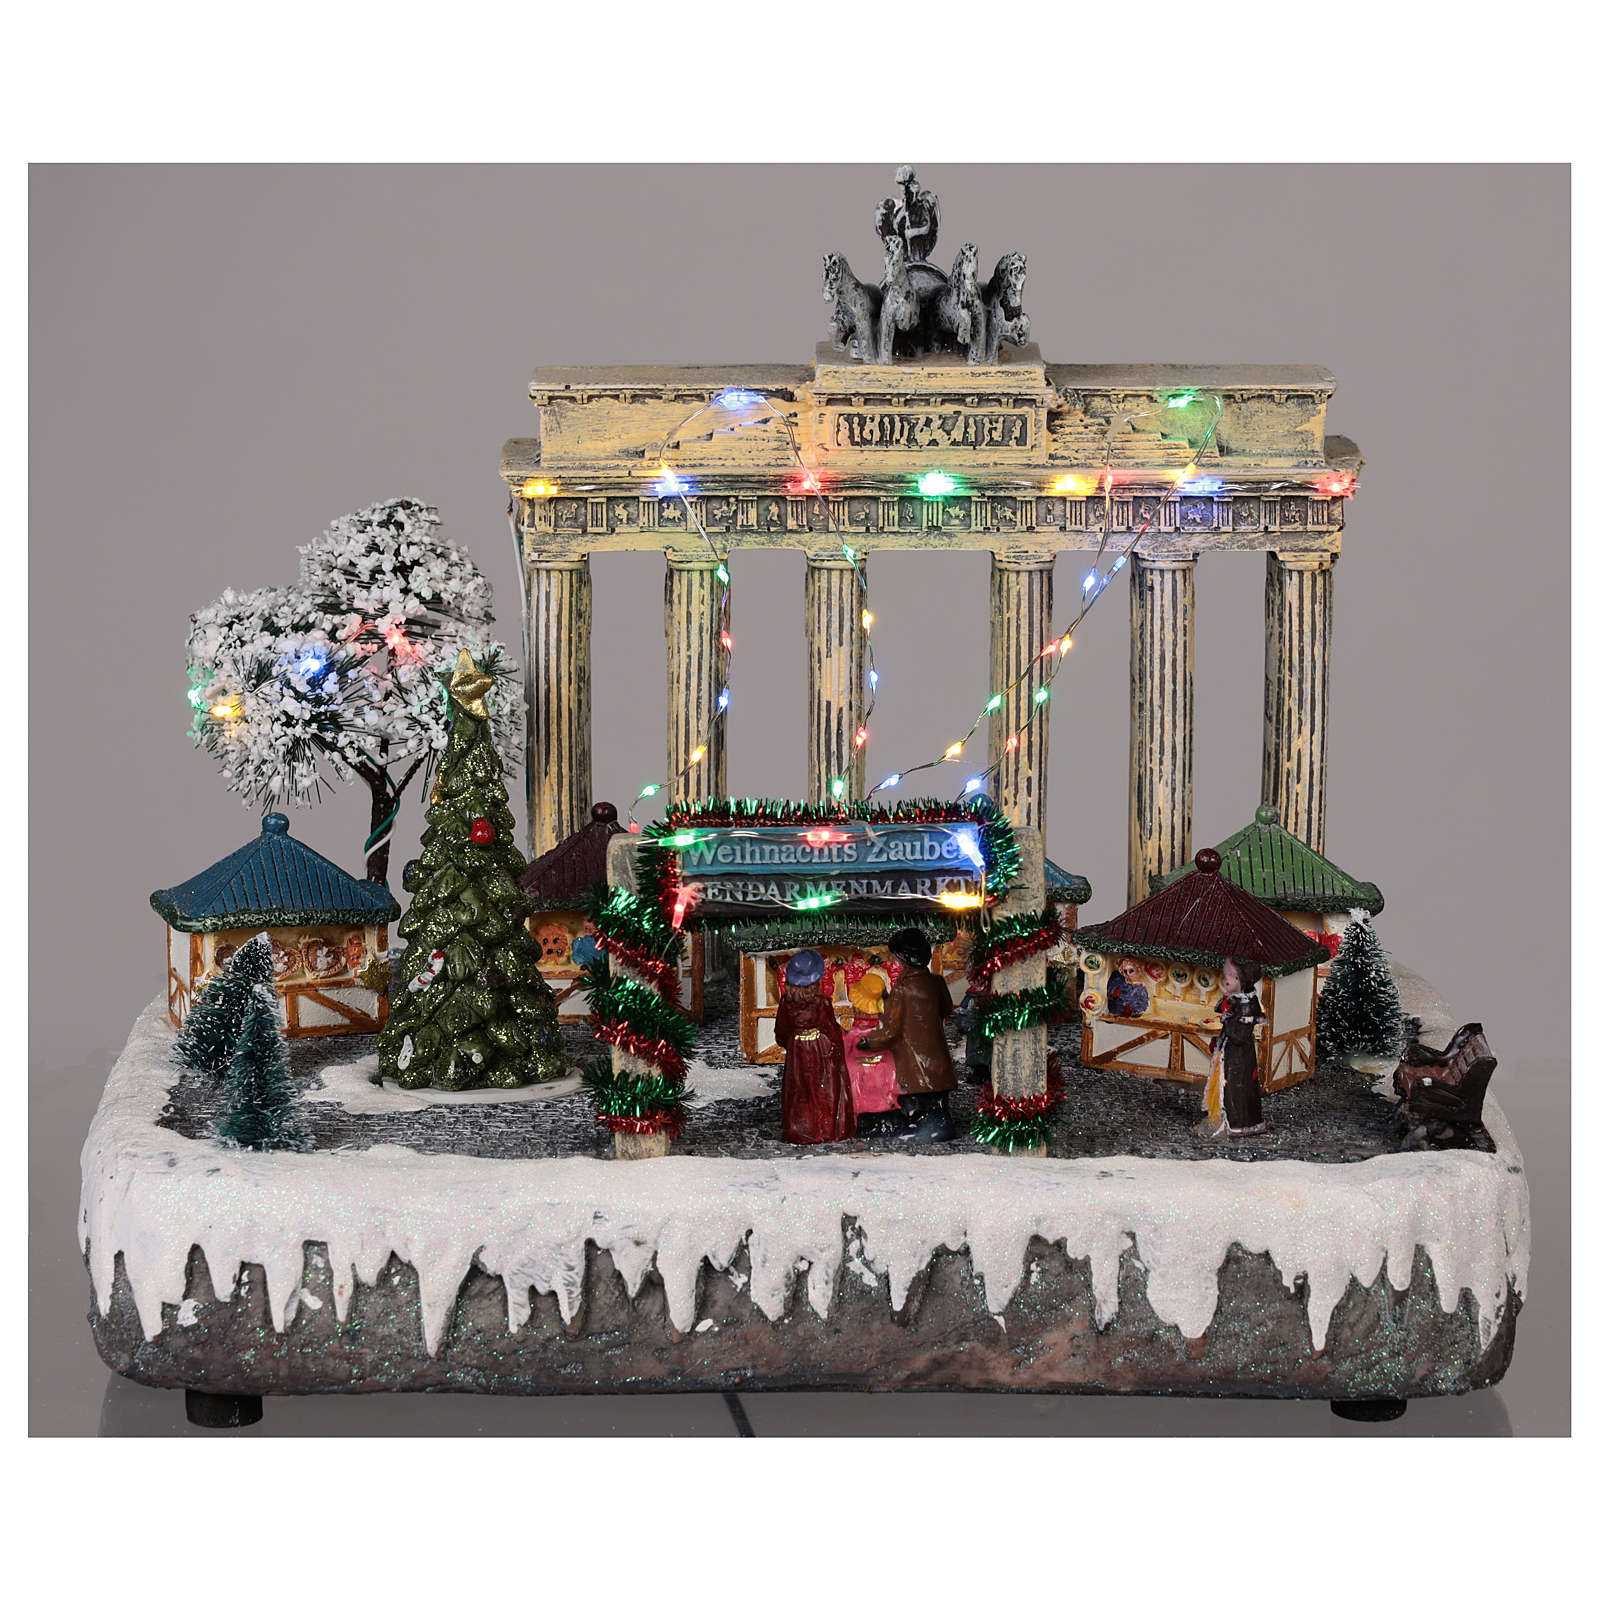 Berlin Christmas village movement lights music 25x20x25 cm 3